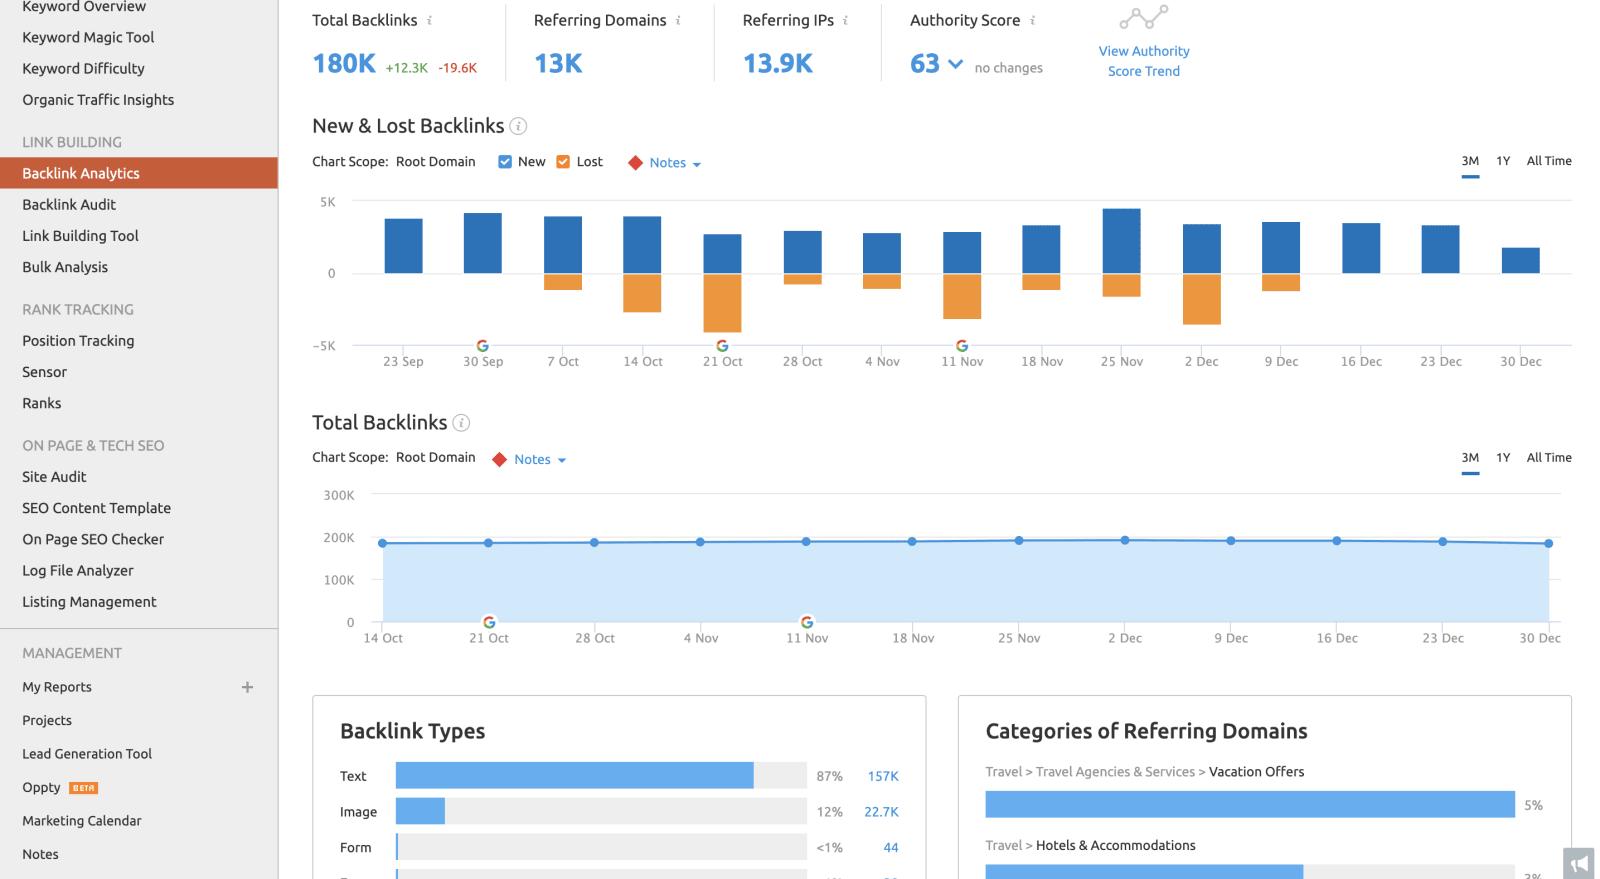 SEMrush vs Serpstat backlink analysis dashboard 2